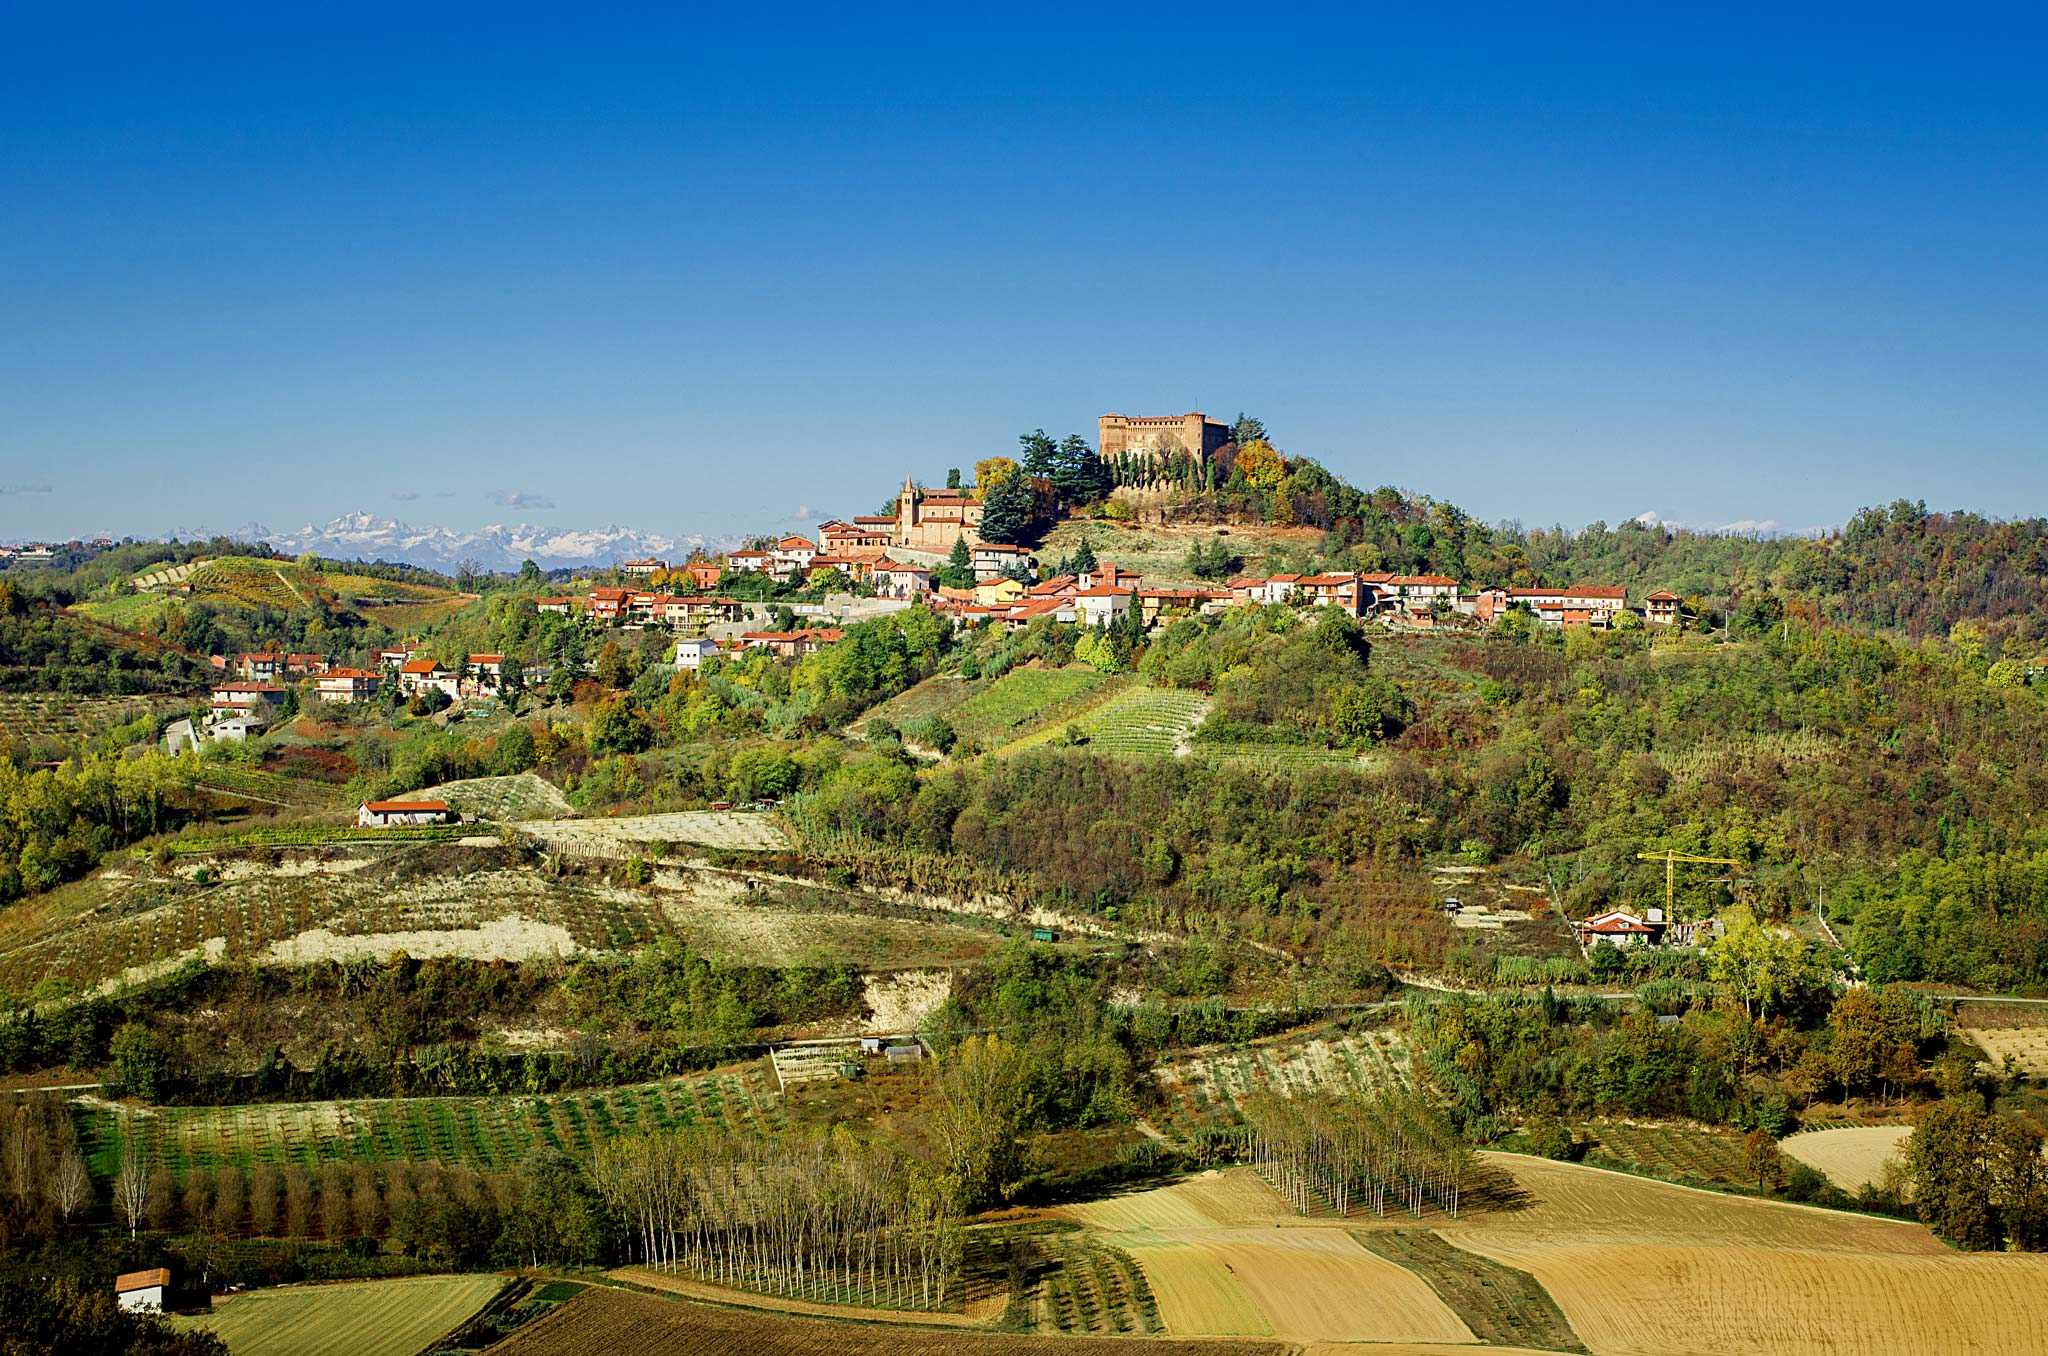 Paesaggi-Italia - Emanuele Tibaldi Fotografo Roero - Fotografo di paesaggi Roero monticello d'alba - Fotografo di paesaggi Roero monticello d'alba